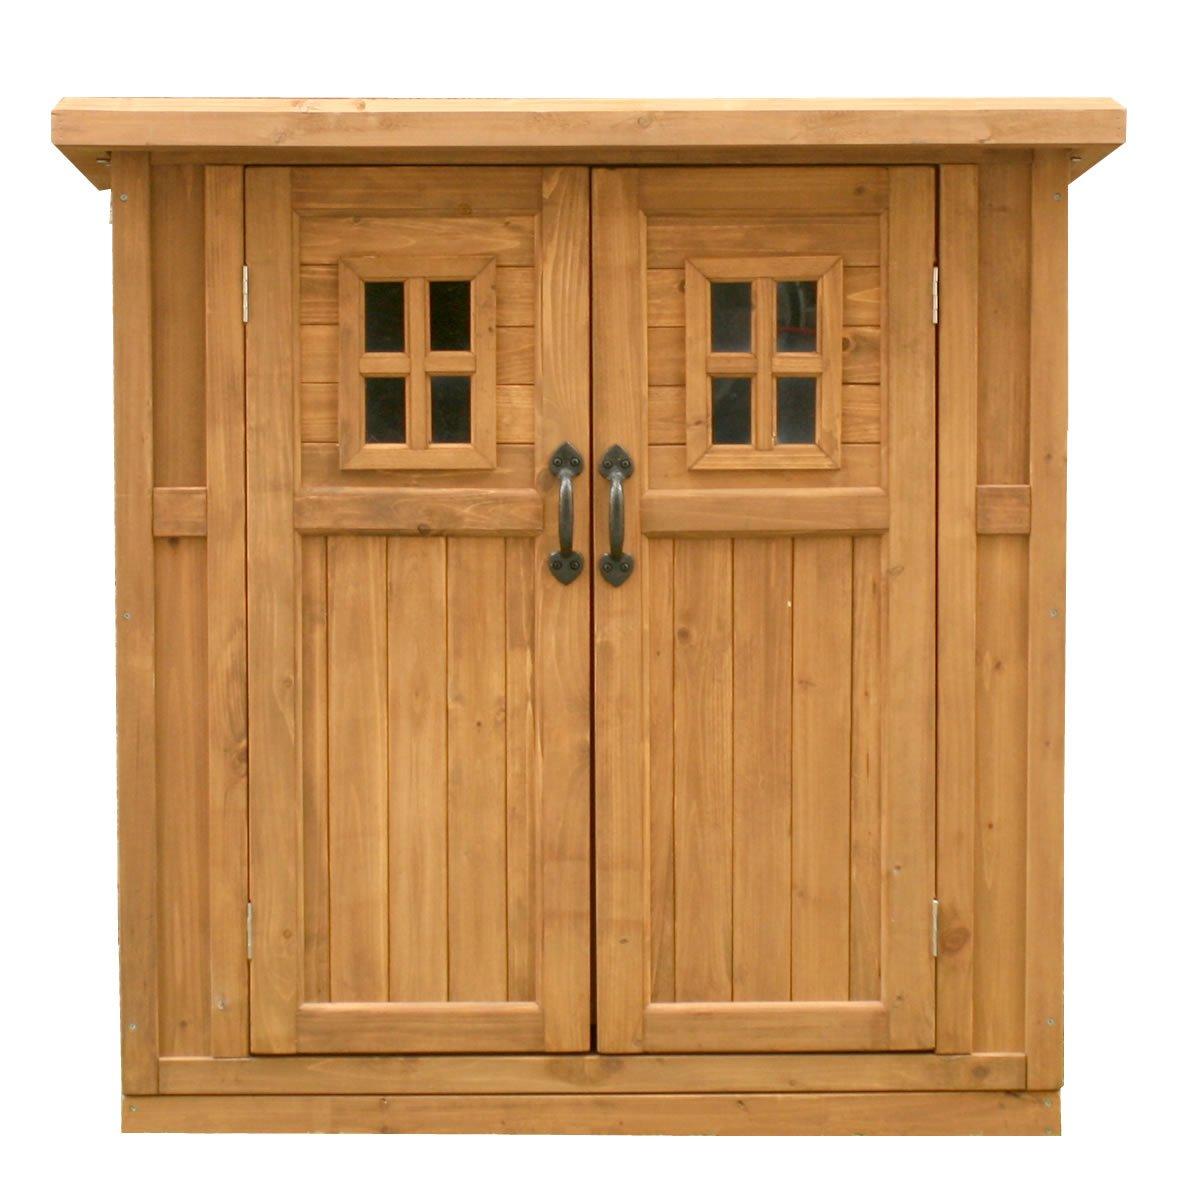 AHEART 物置 木製 小型 屋外 物置小屋 収納庫 天然木 ガーデニング SI 391 ライトブラウン B07DCMCYJ8  ライトブラウン